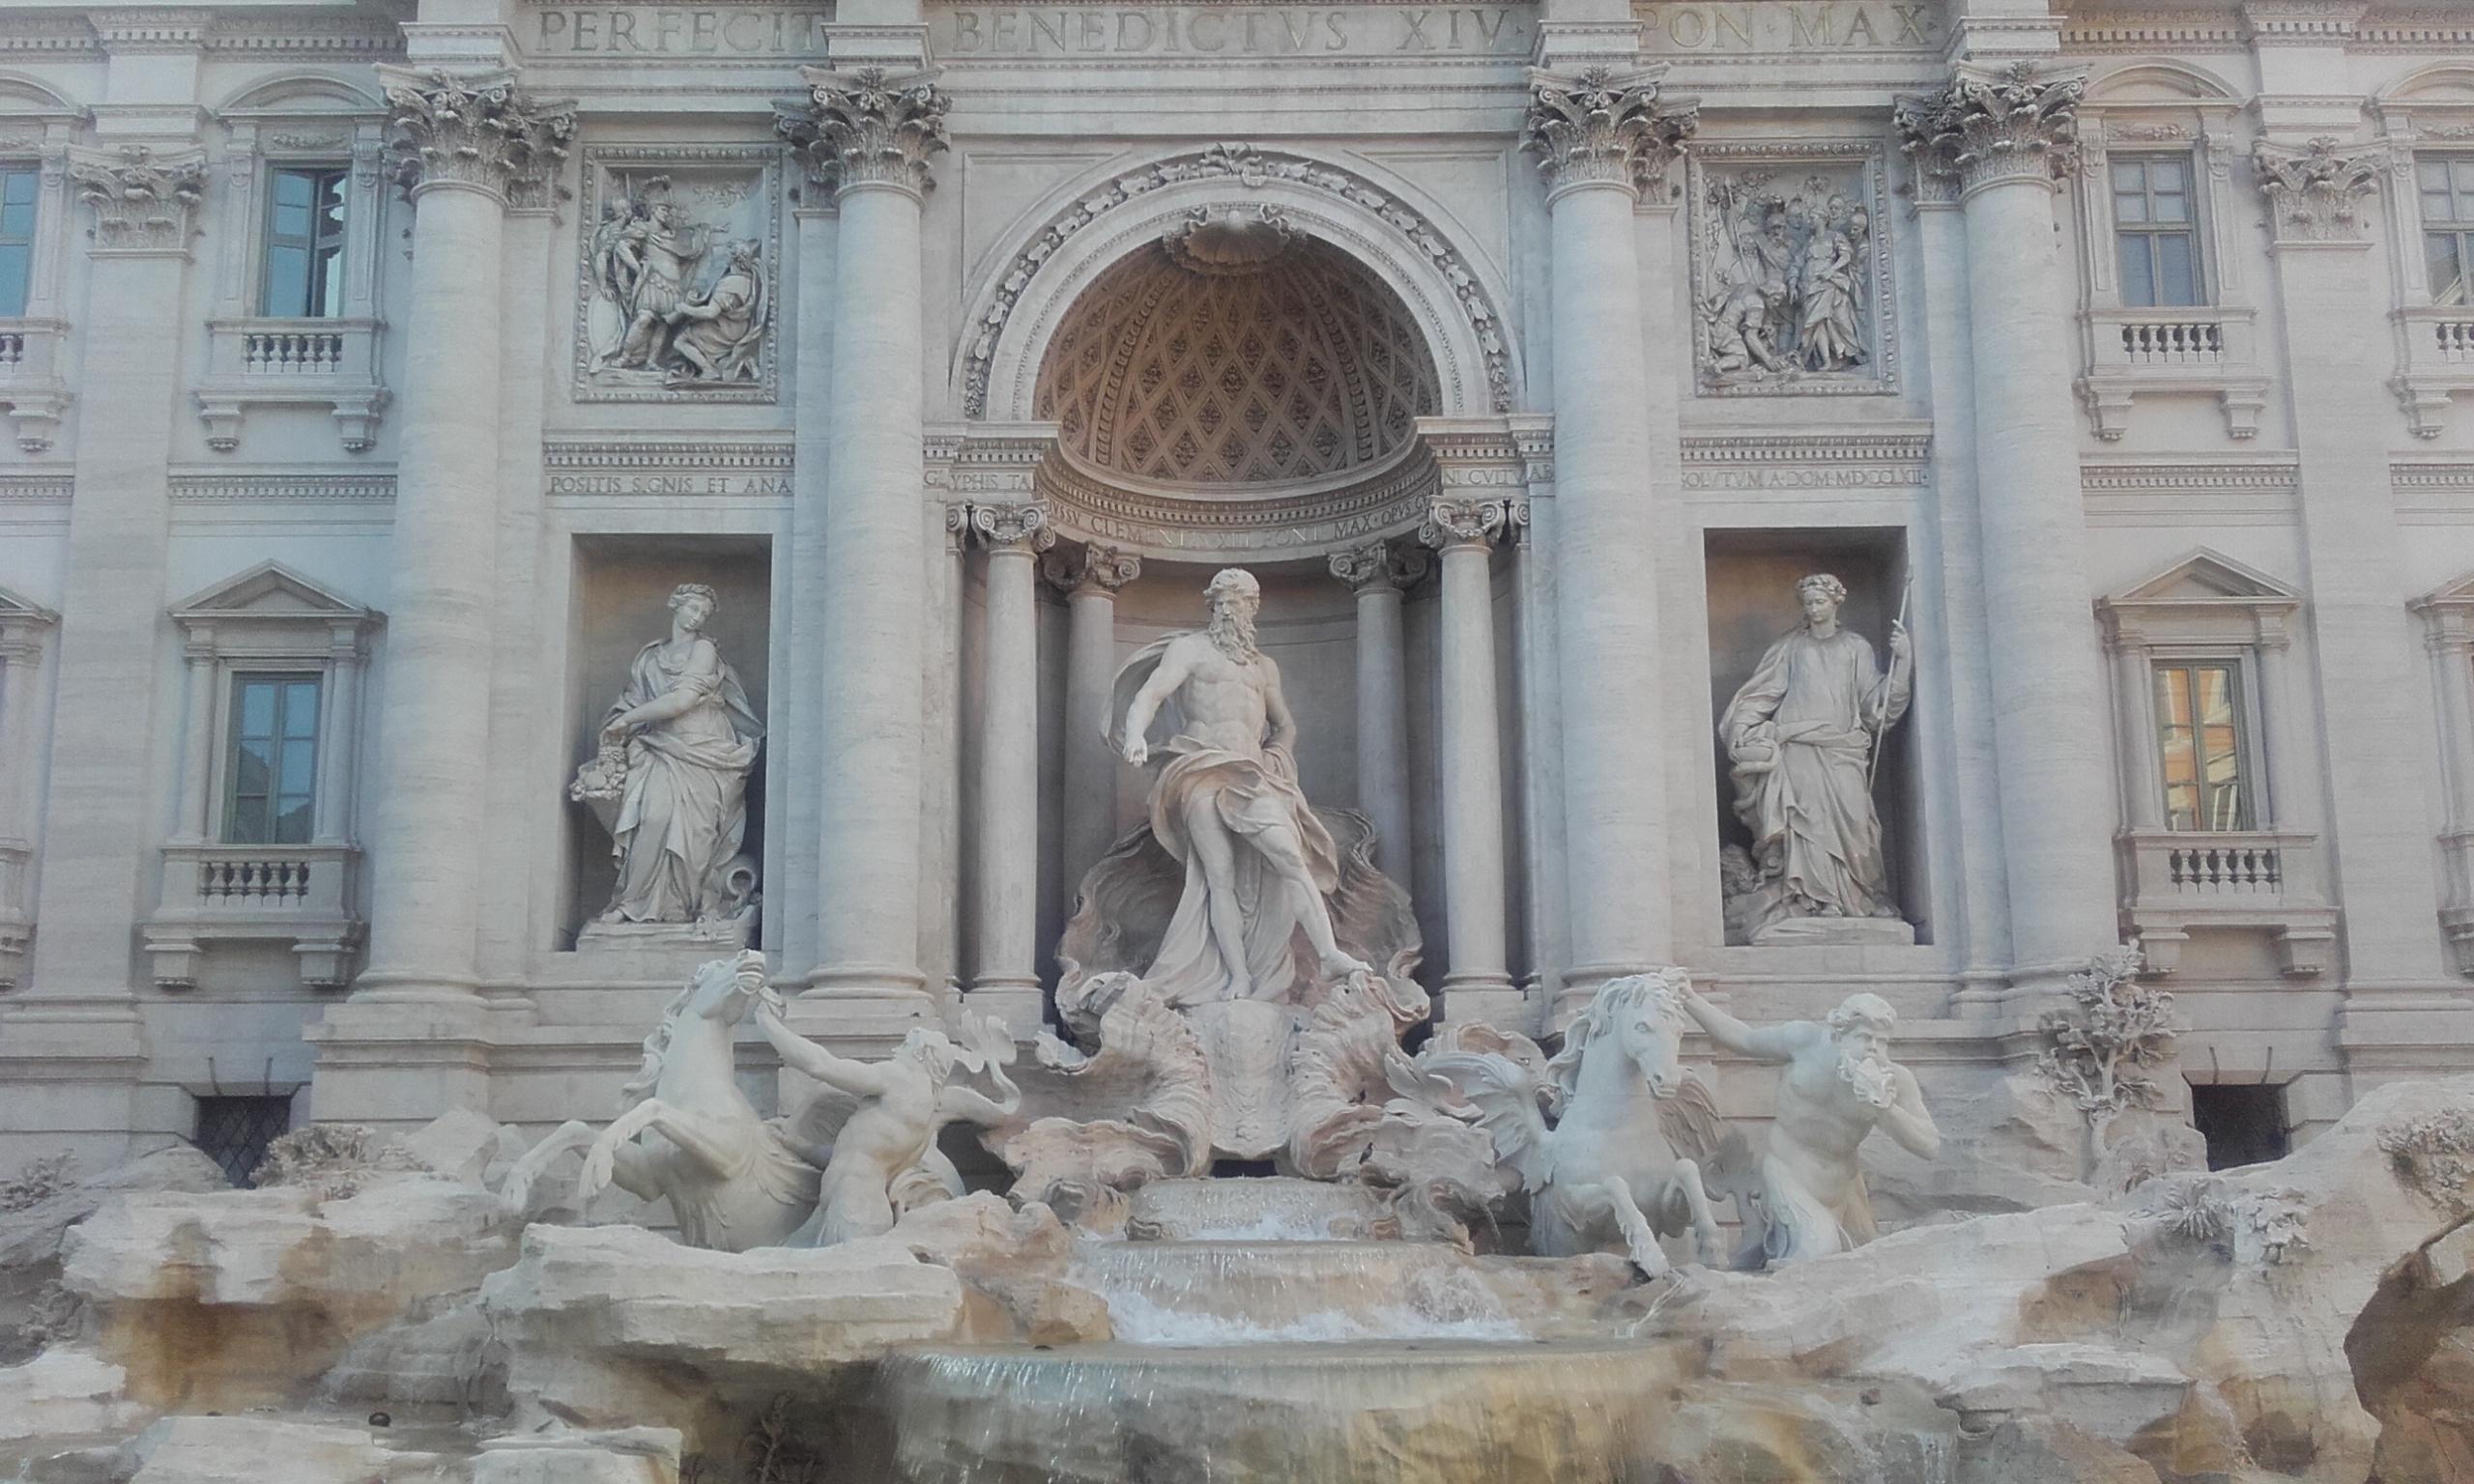 La Fontana di Trevi, de frente